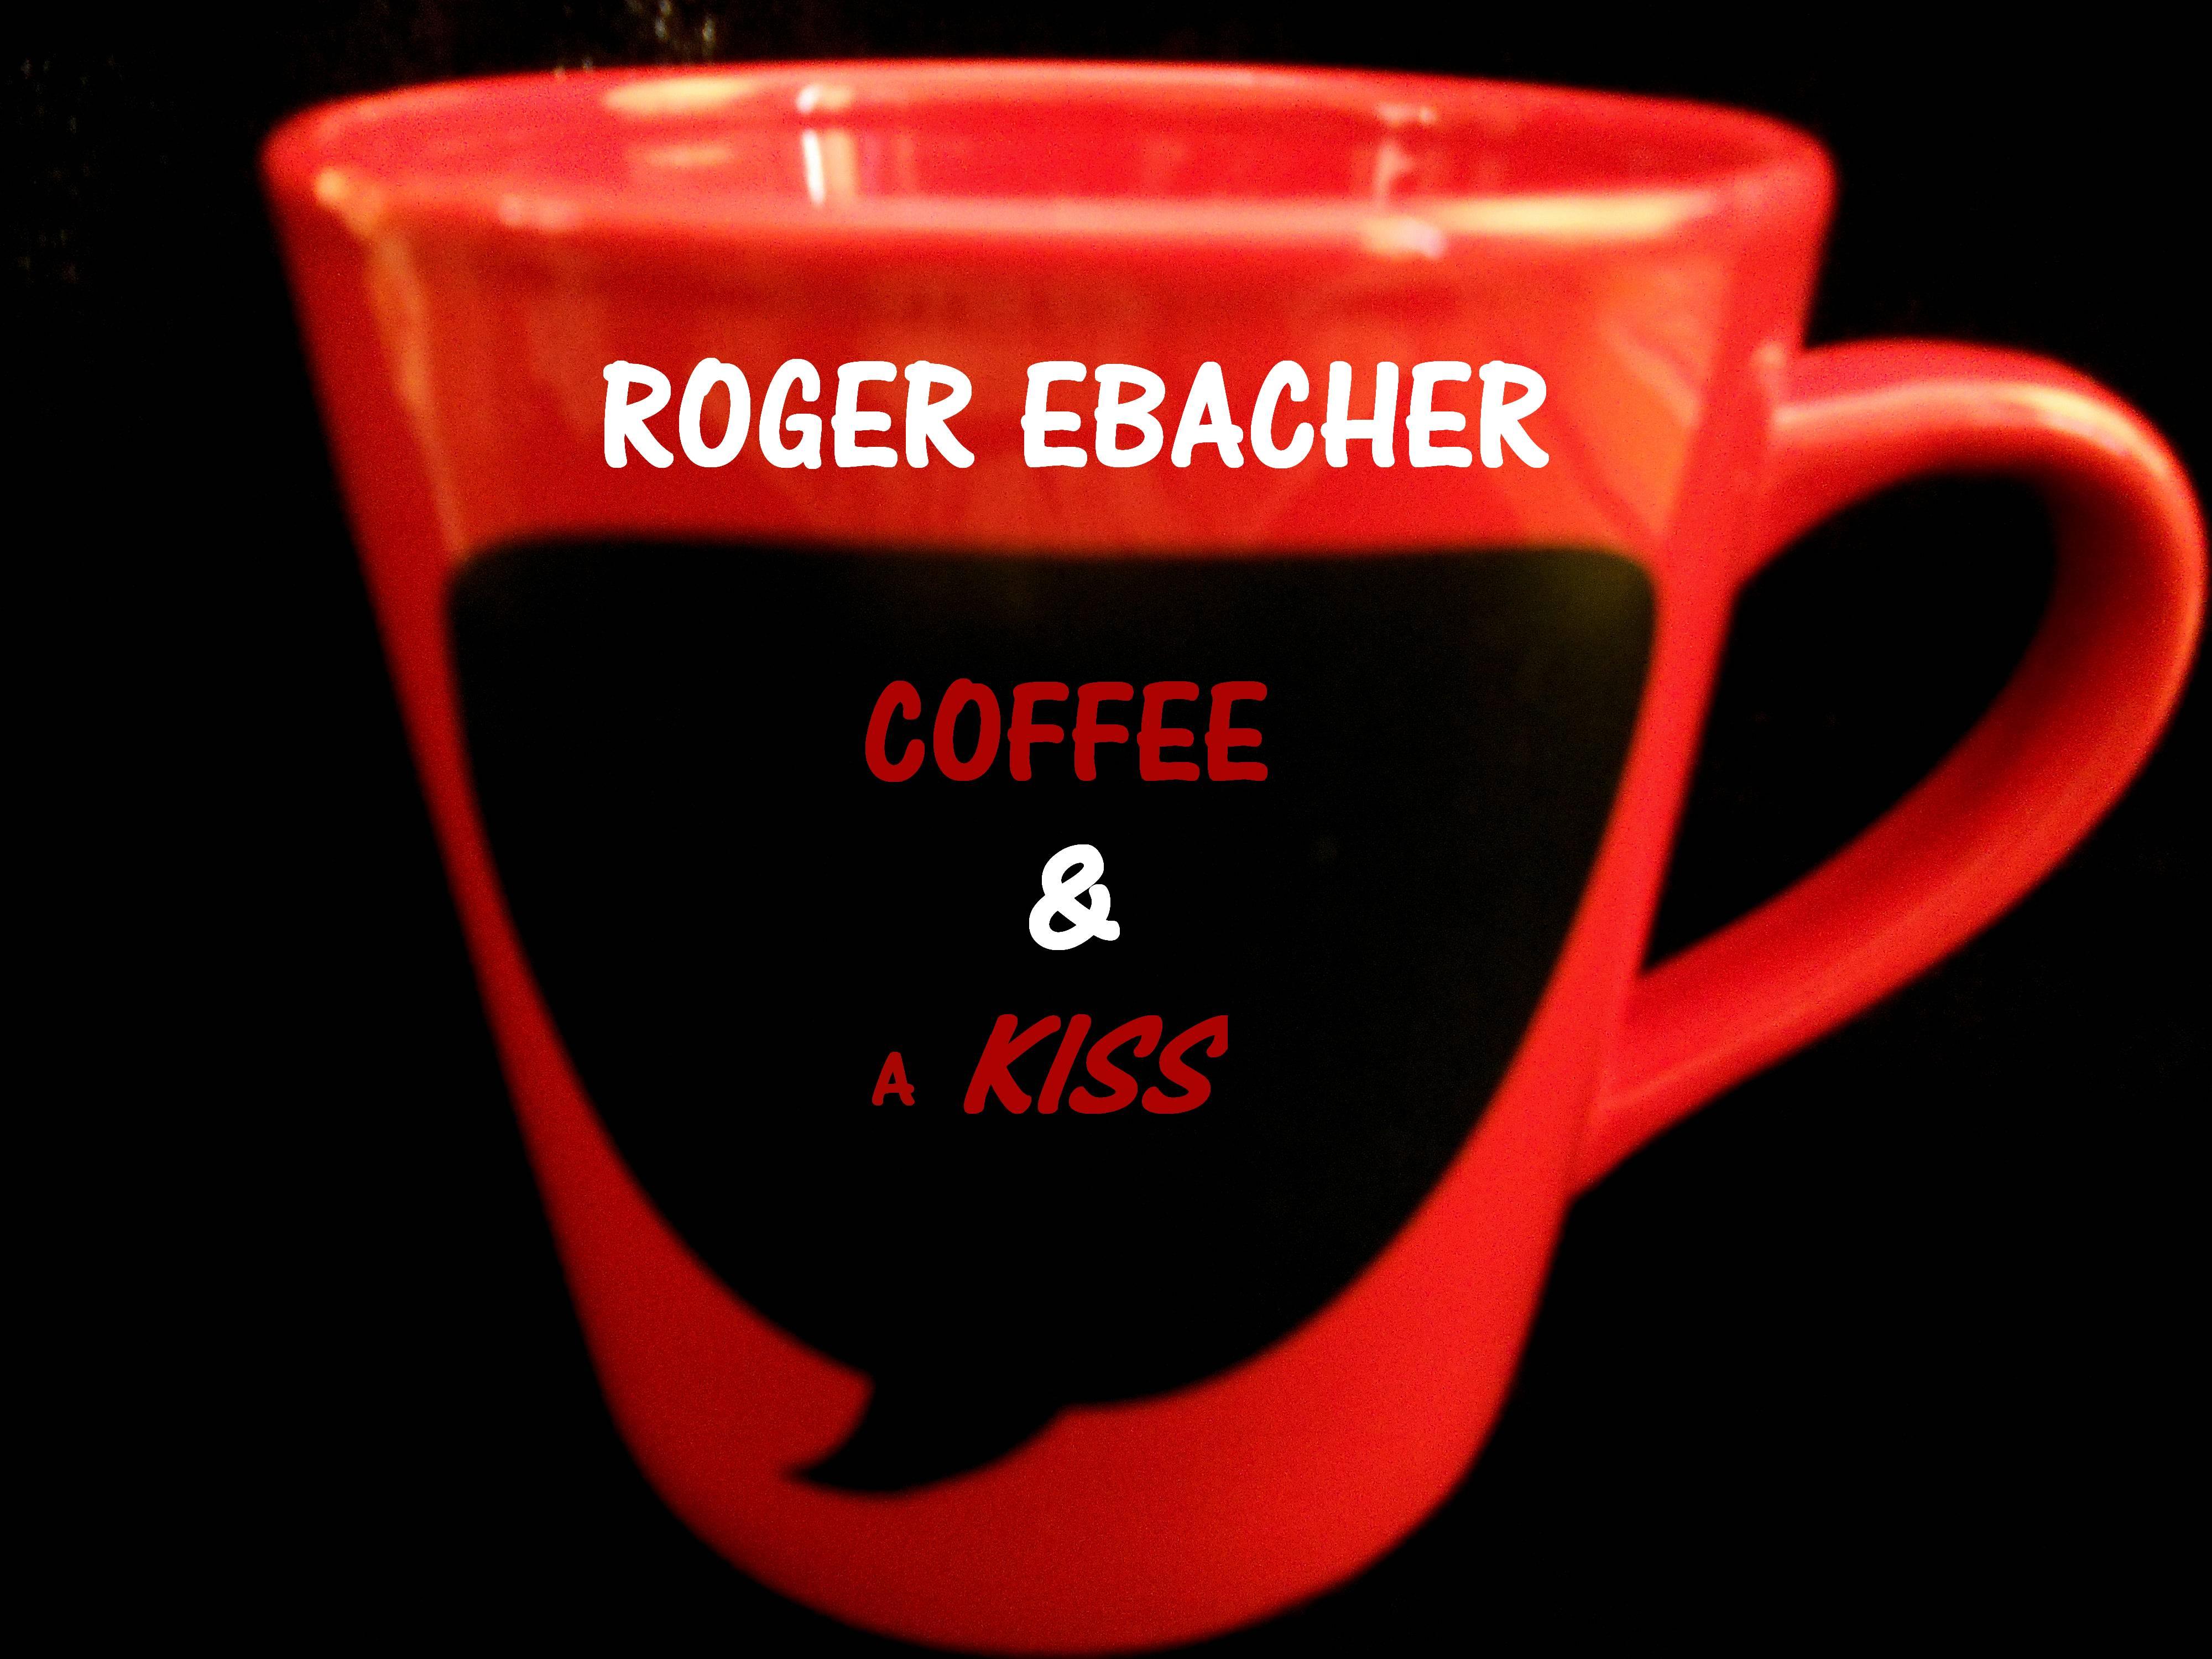 COFFEE & A KISS